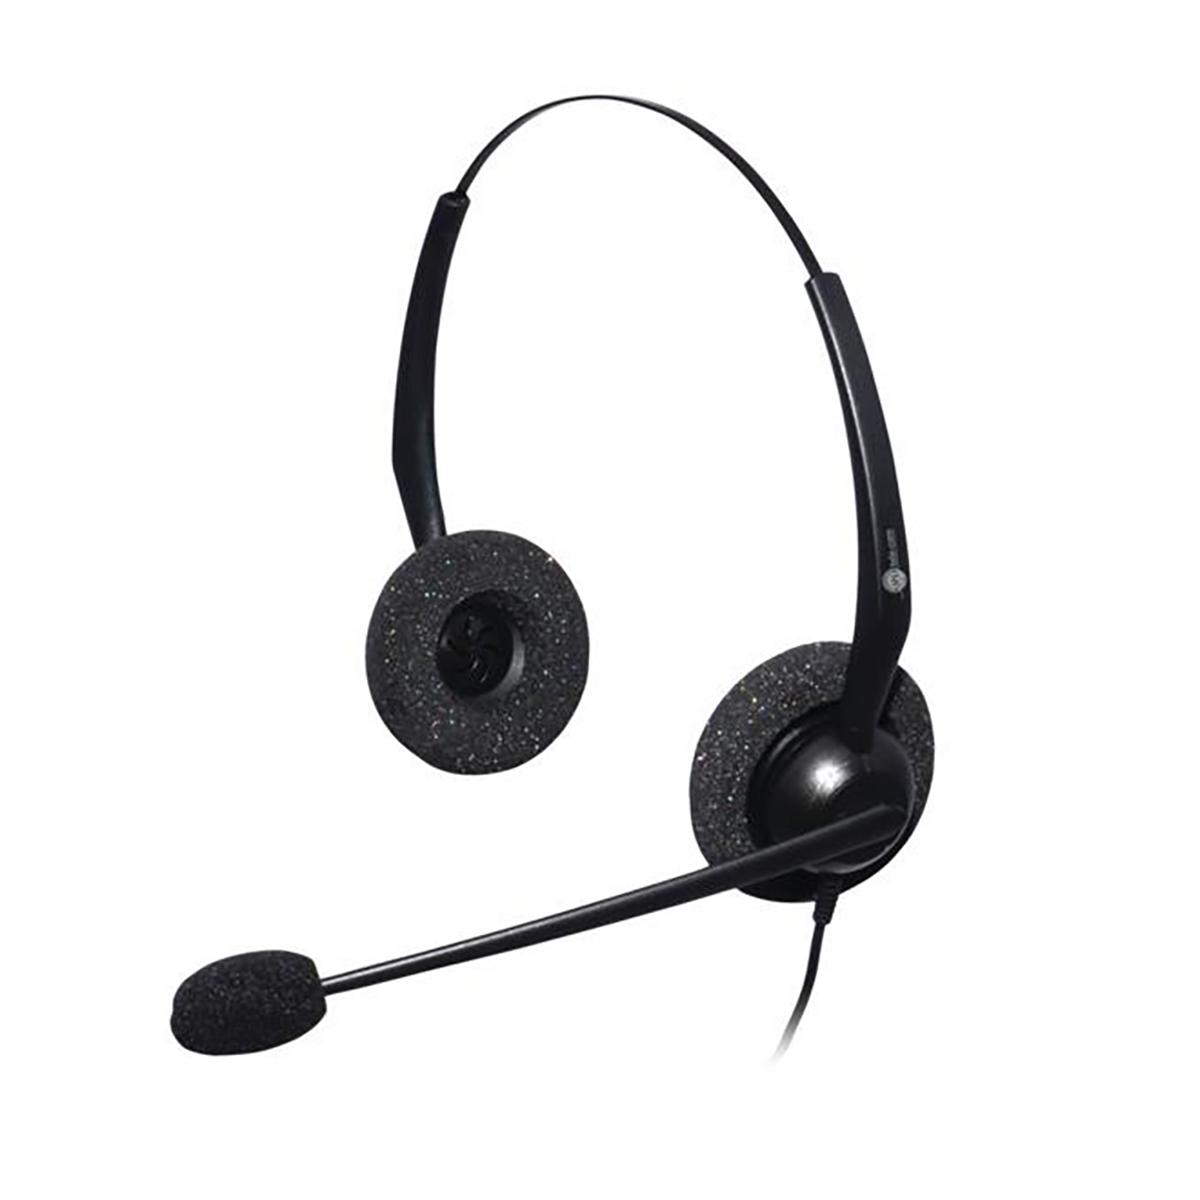 JPL Jac Plus Binaural Headset With Plantronics QD Plug